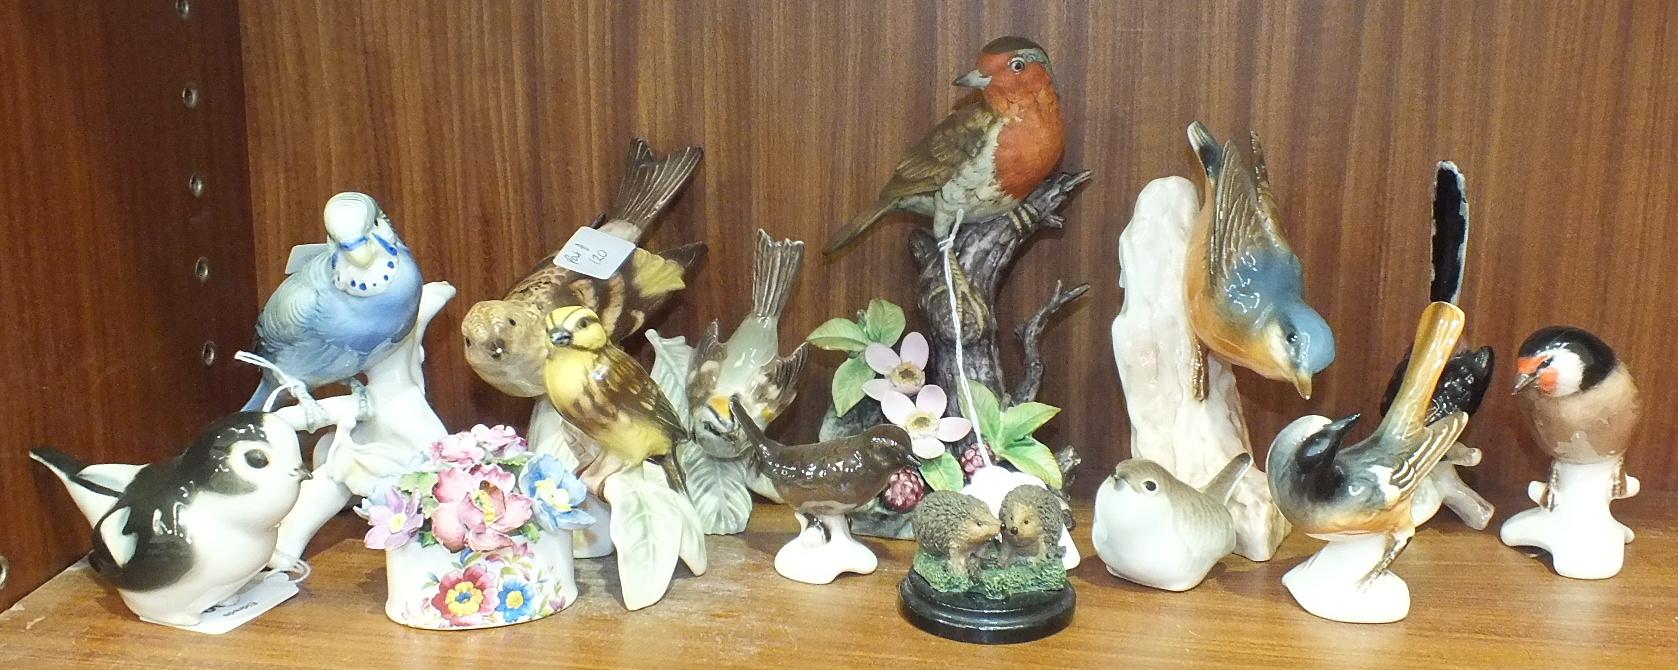 Lot 120 - A collection of twelve Goebel and Lomonosov porcelain bird ornaments, (12).